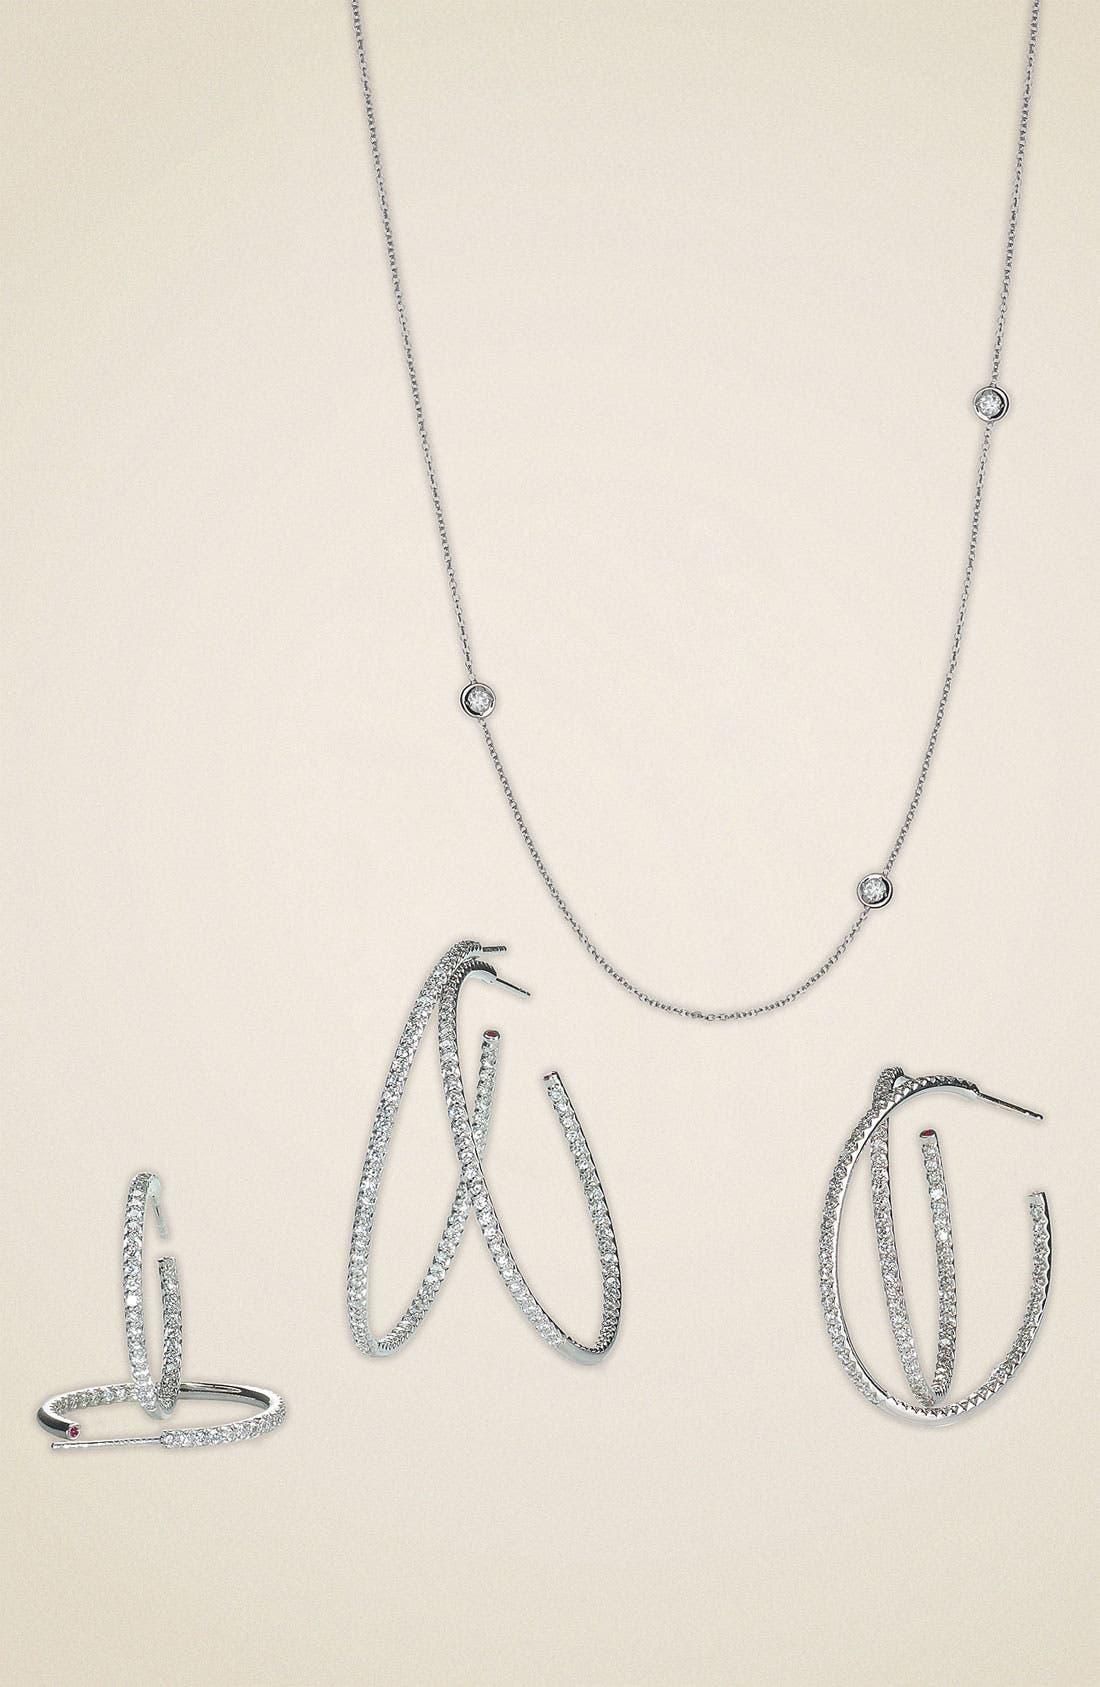 ROBERTO COIN,                             Extra Large Diamond Hoop Earrings,                             Alternate thumbnail 3, color,                             711